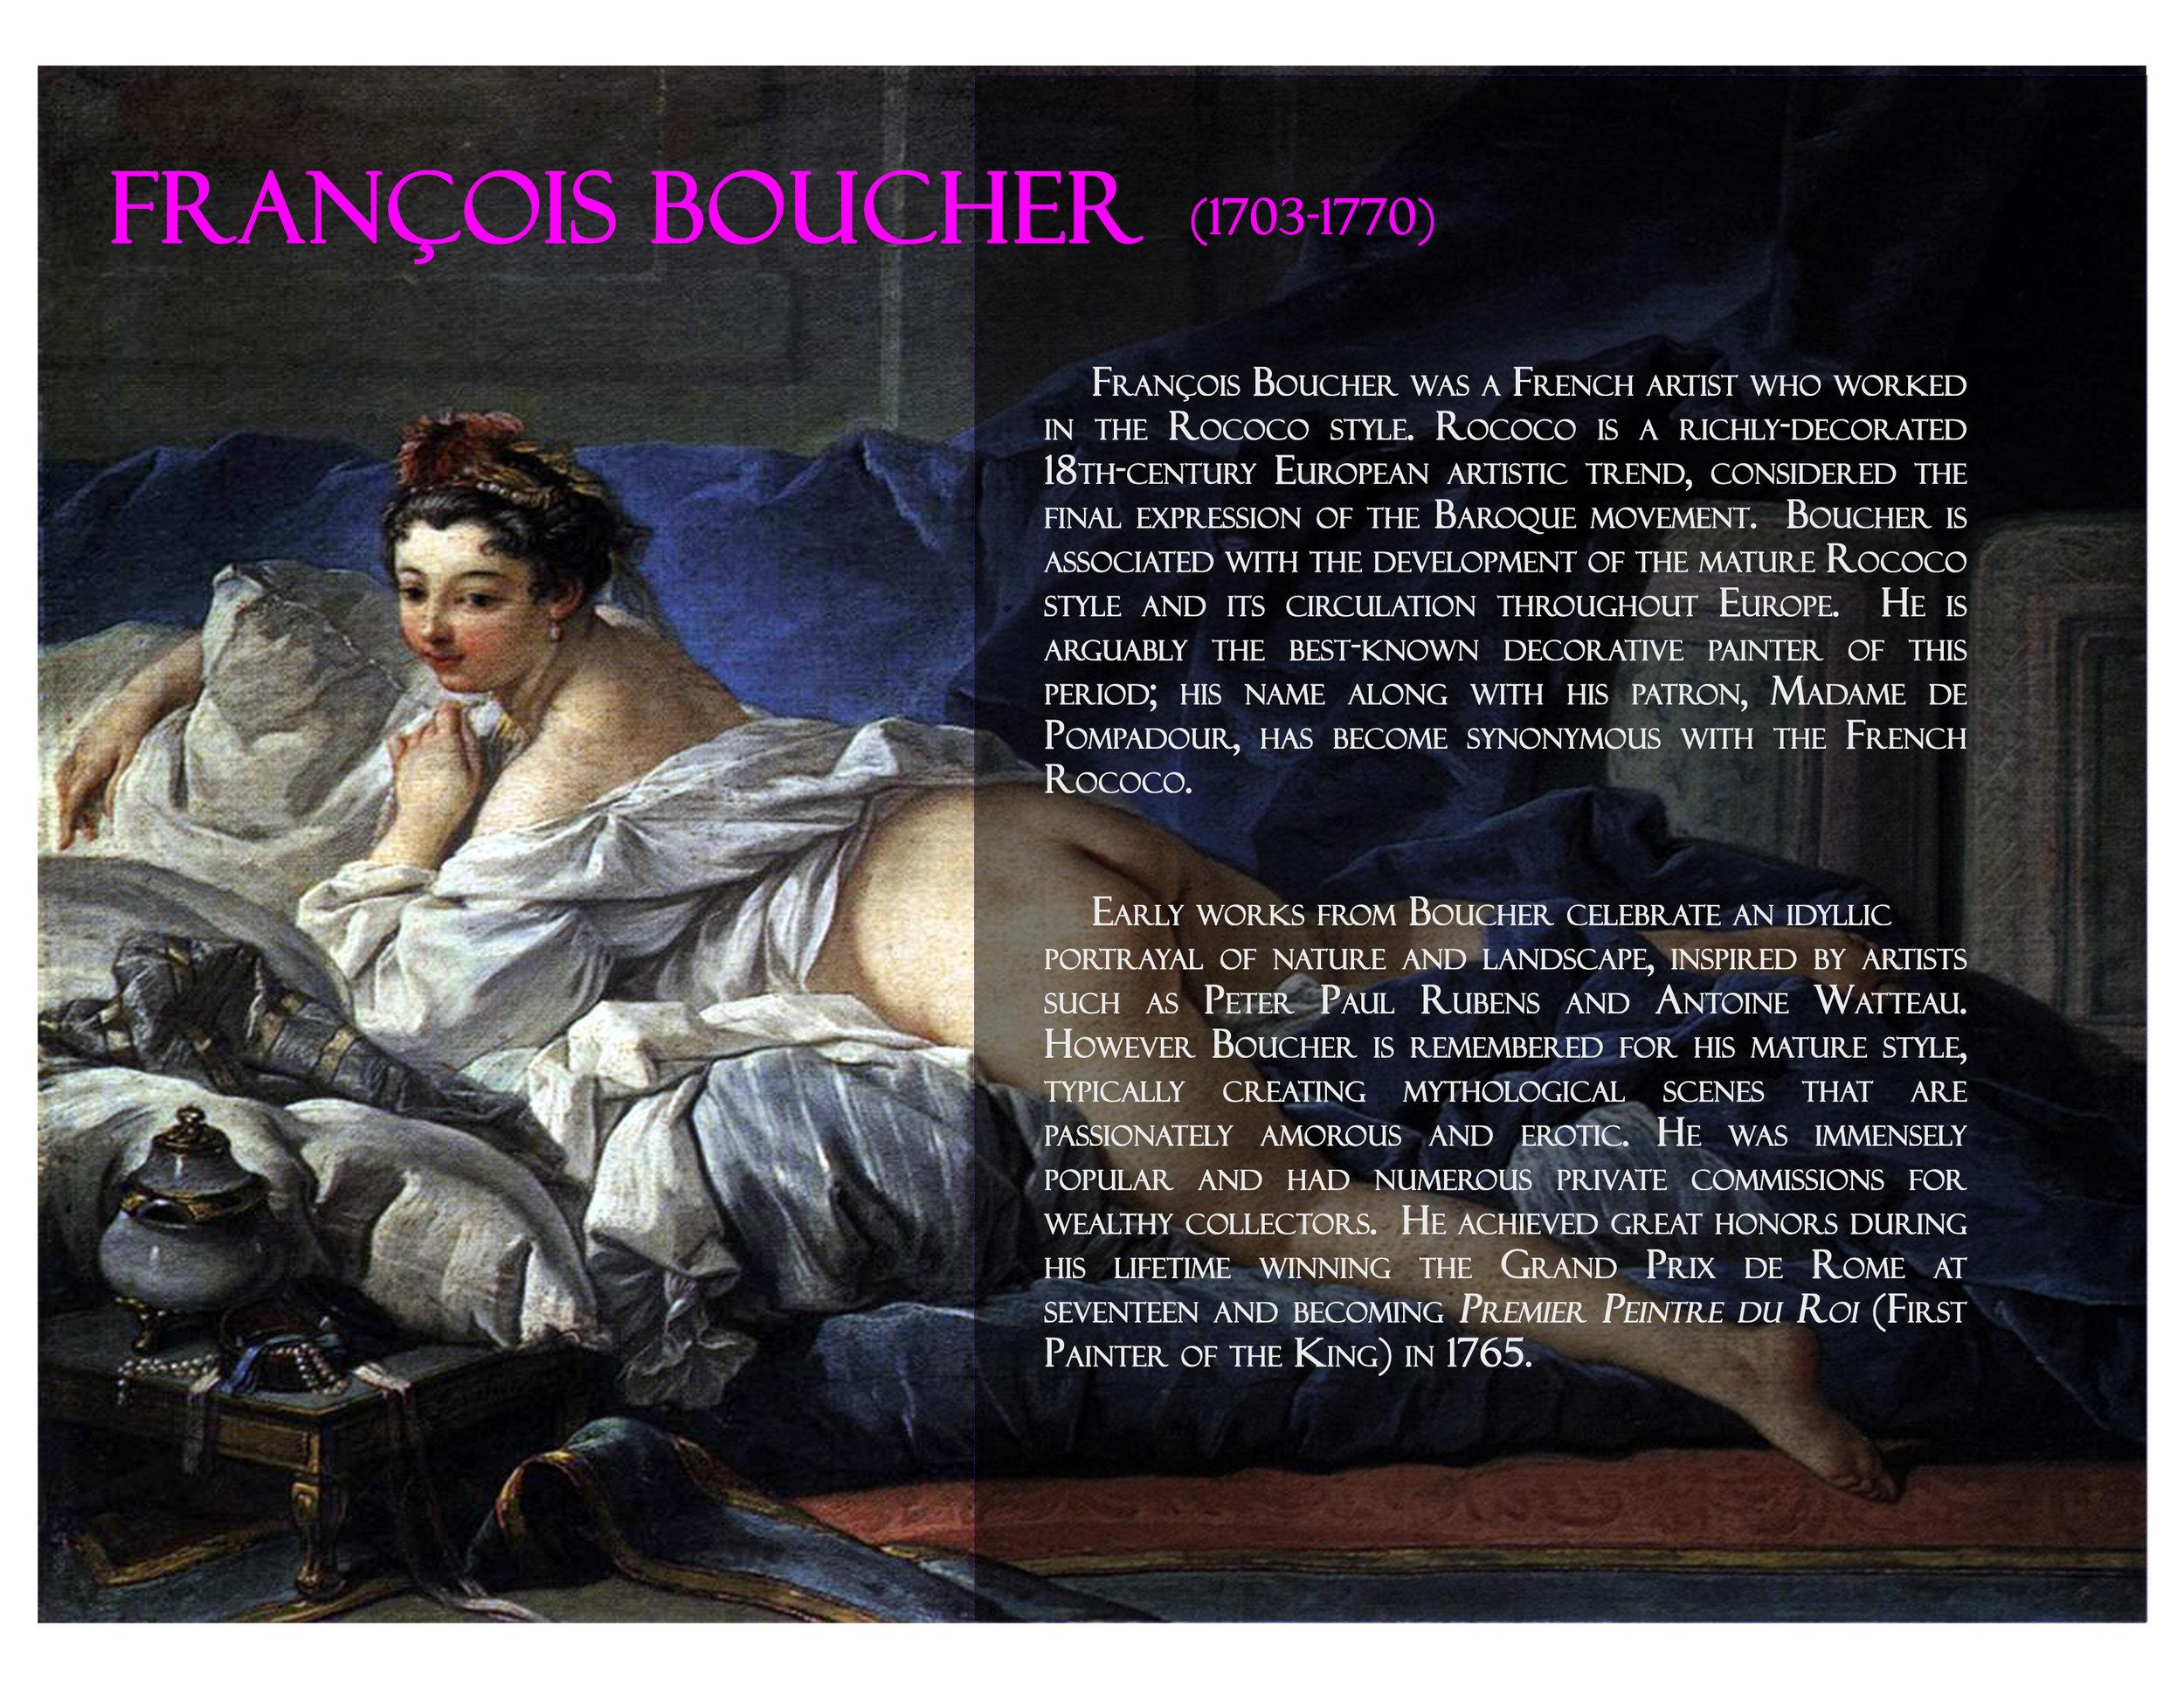 002_francois boucher bio.jpg